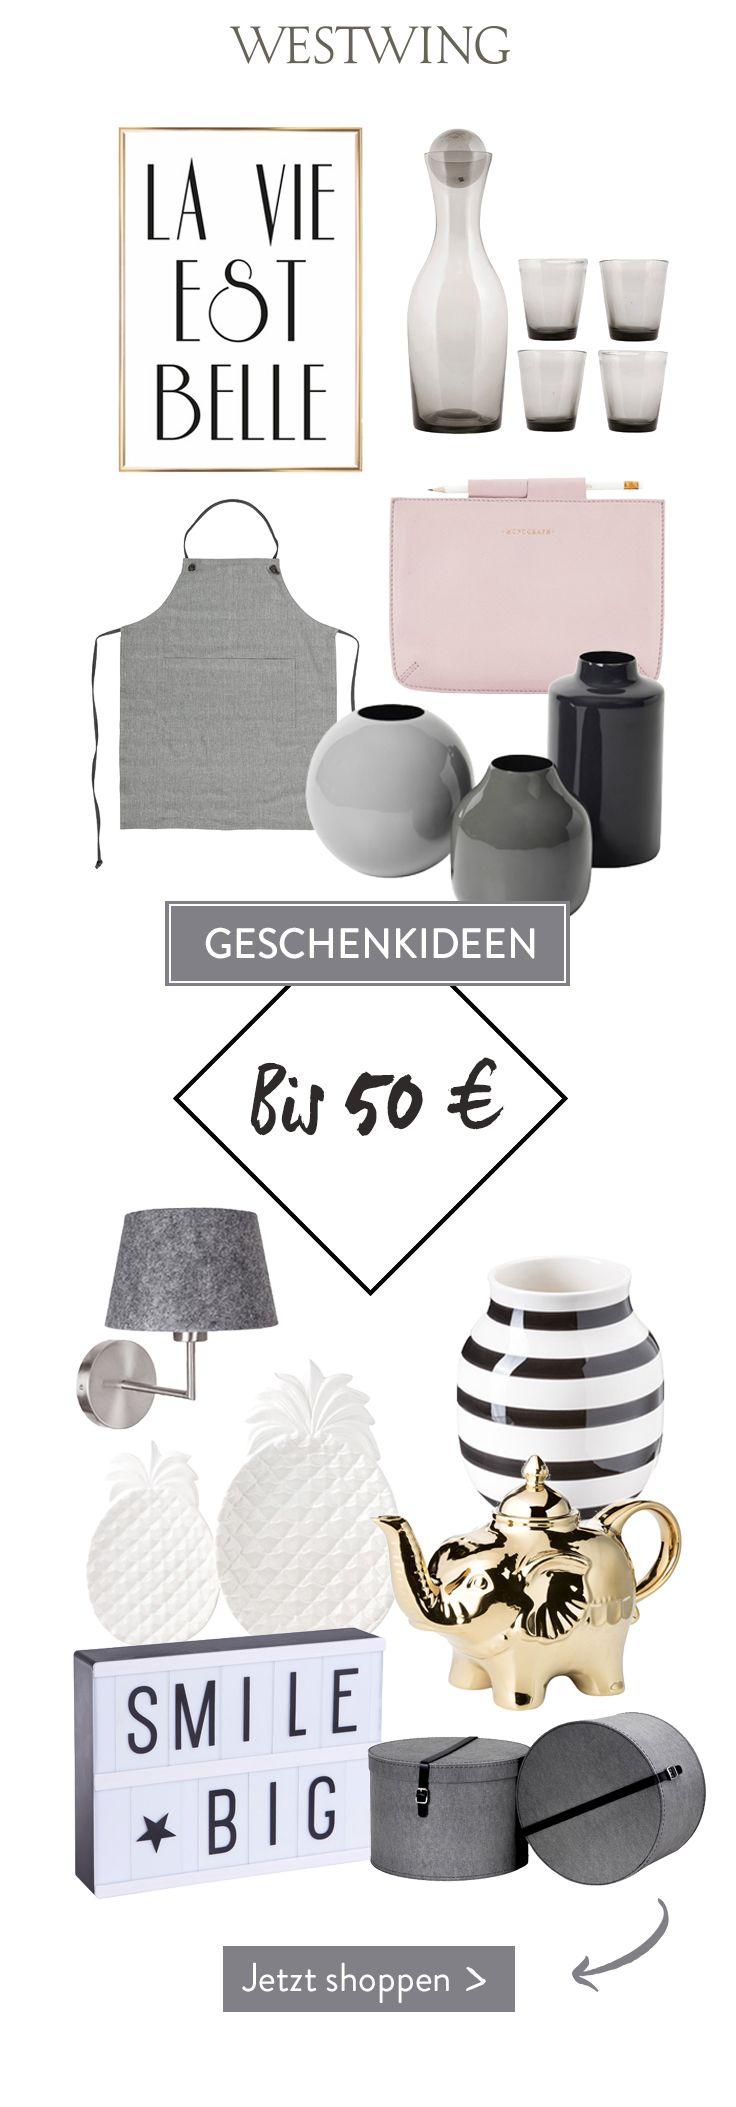 132 best geschenkideen f r geburtstag einweihung co images on pinterest interior bedroom. Black Bedroom Furniture Sets. Home Design Ideas